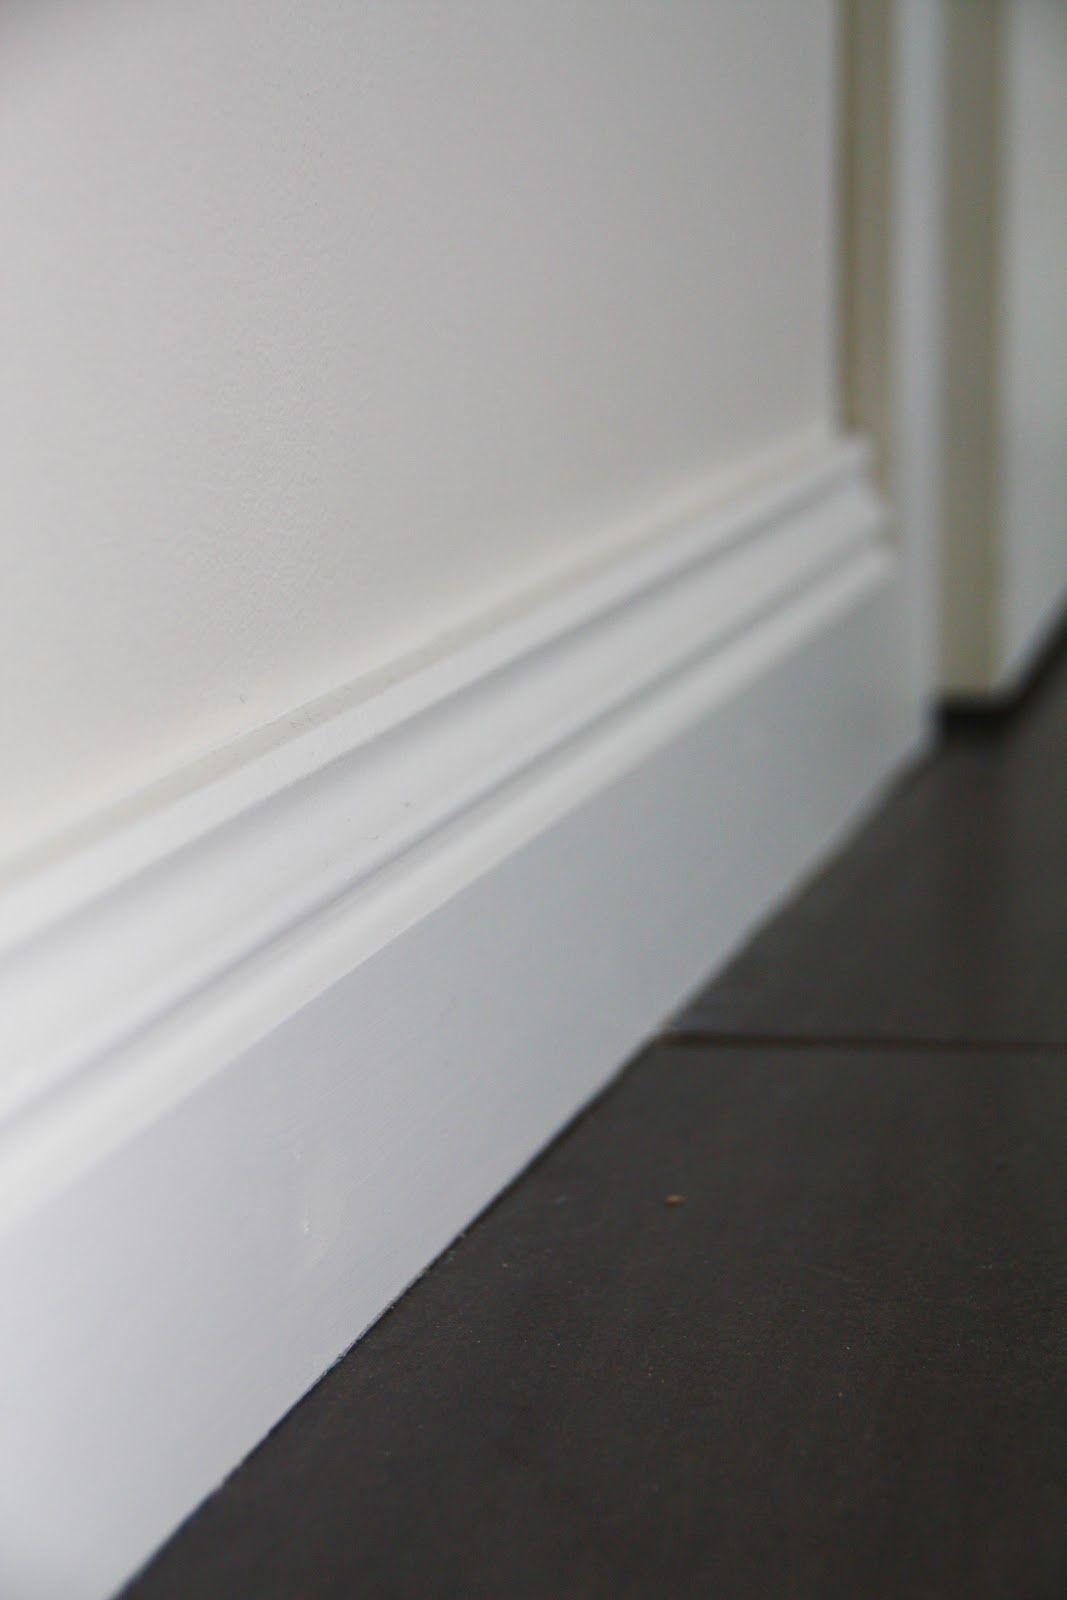 Pin By K Alshamsi On جبس جدران Skirting Boards Skirting Floor Molding